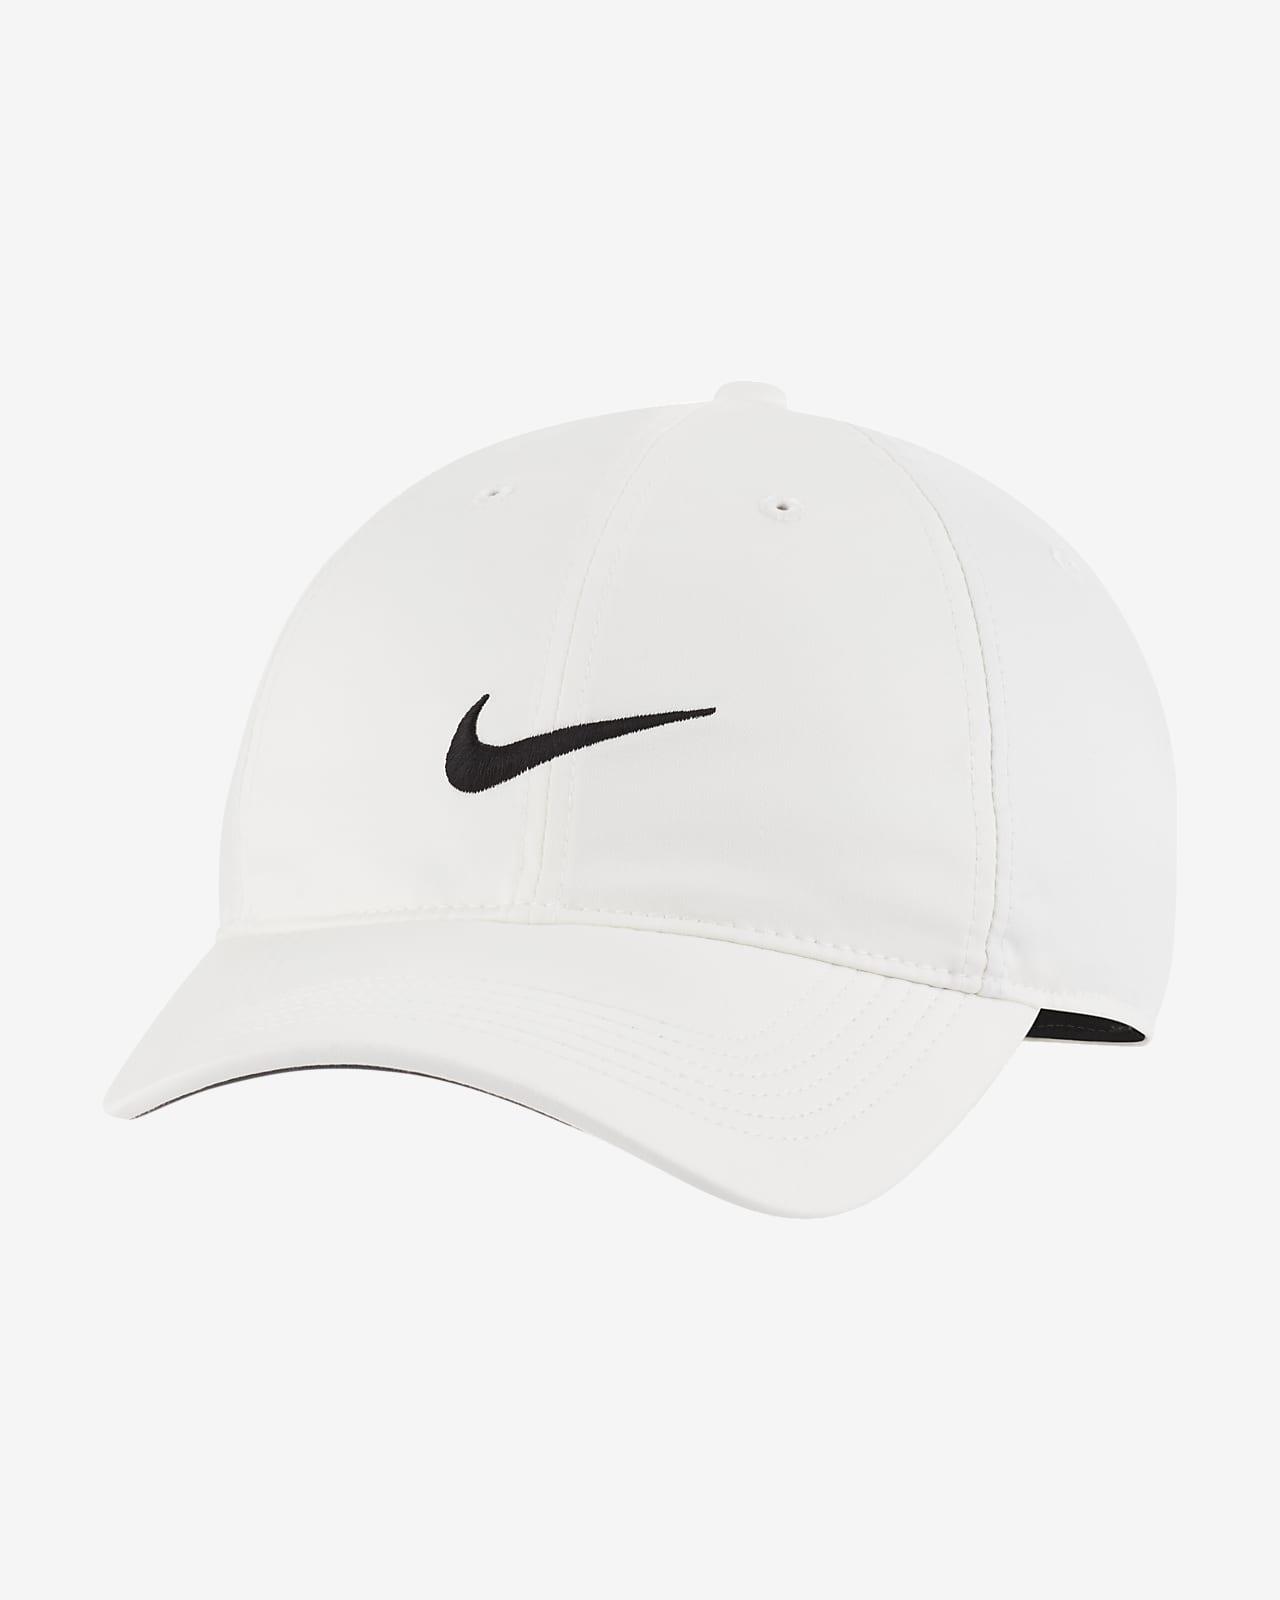 Nike AeroBill Heritage86 Player Golf Hat